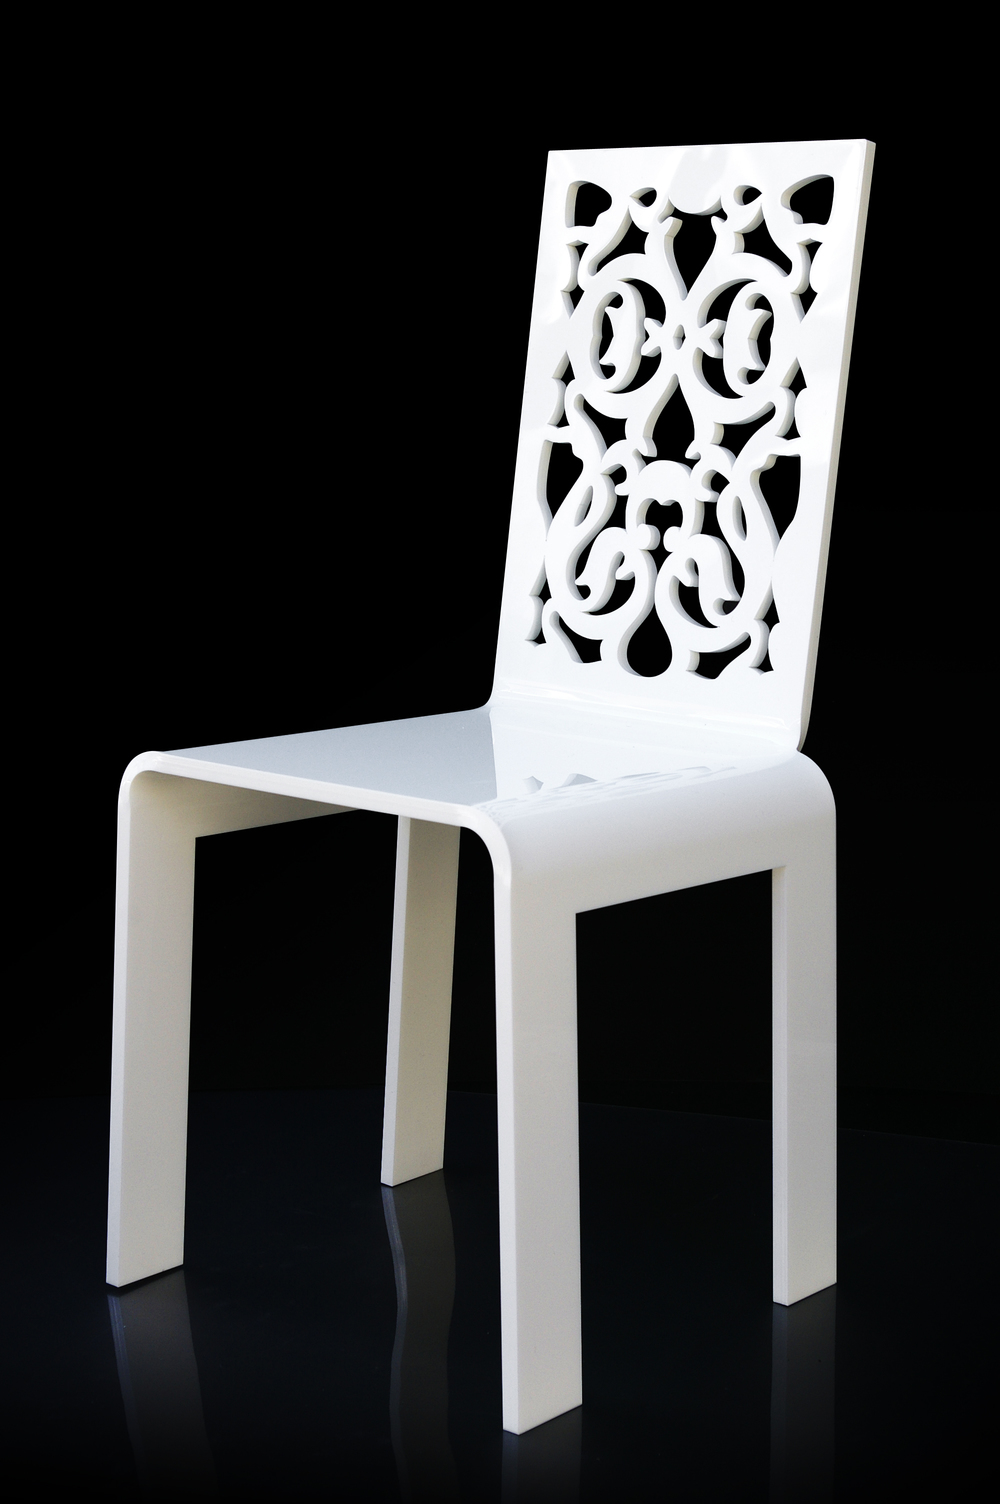 Chaise dentelle blanche Fond noir.jpg